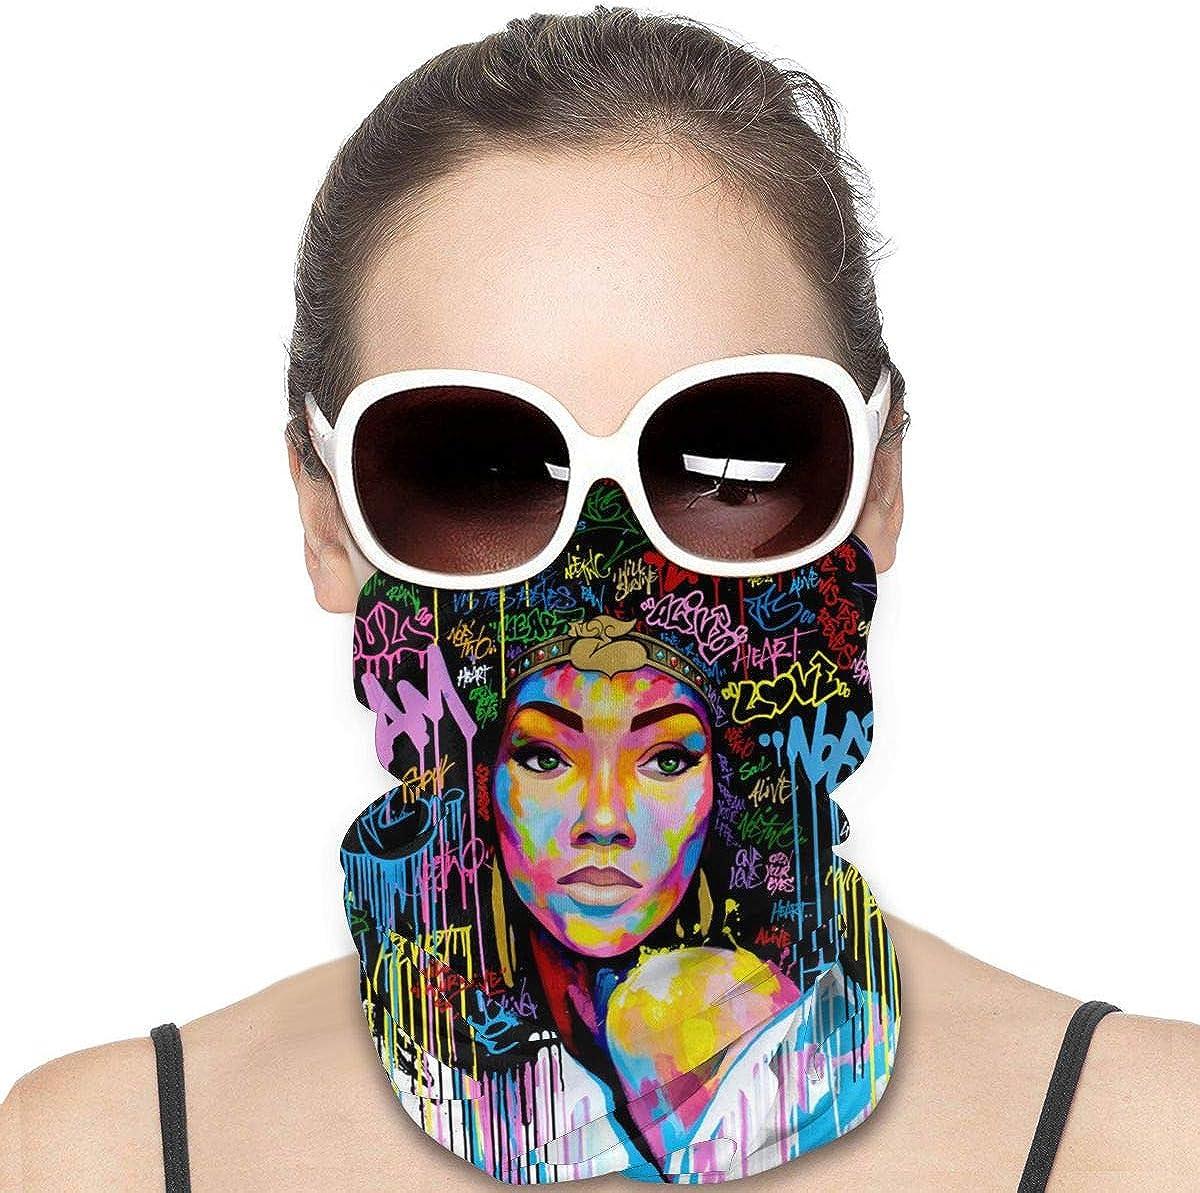 JinSPef Bandana Face Mask - African American Women with Afro Urban Graffiti Bandana Face Mask Ski Mask Multifunctional Headwear Head Bands Neck Gaiters for Men Headband Sun Mask